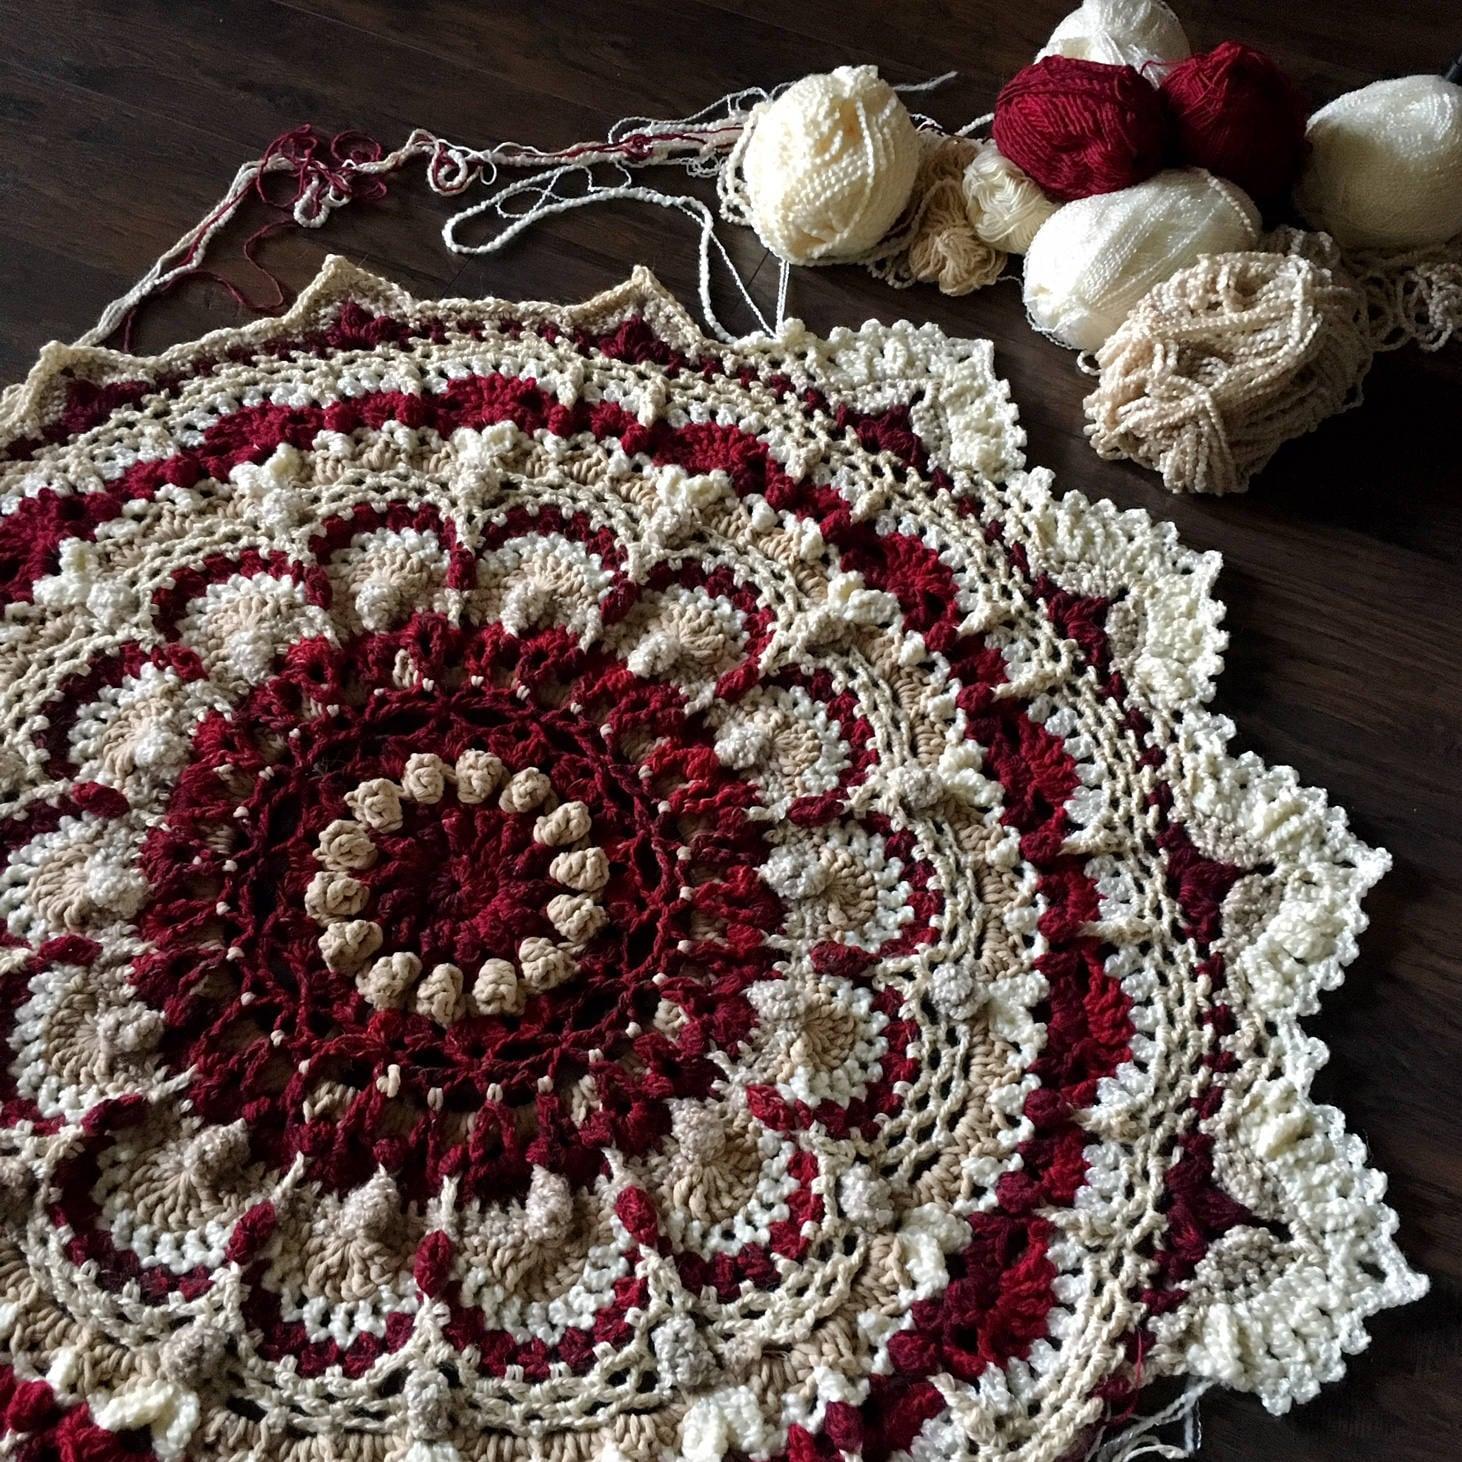 Crochet Mandala Patterncrochet Blanket Patternmeditation Blanket